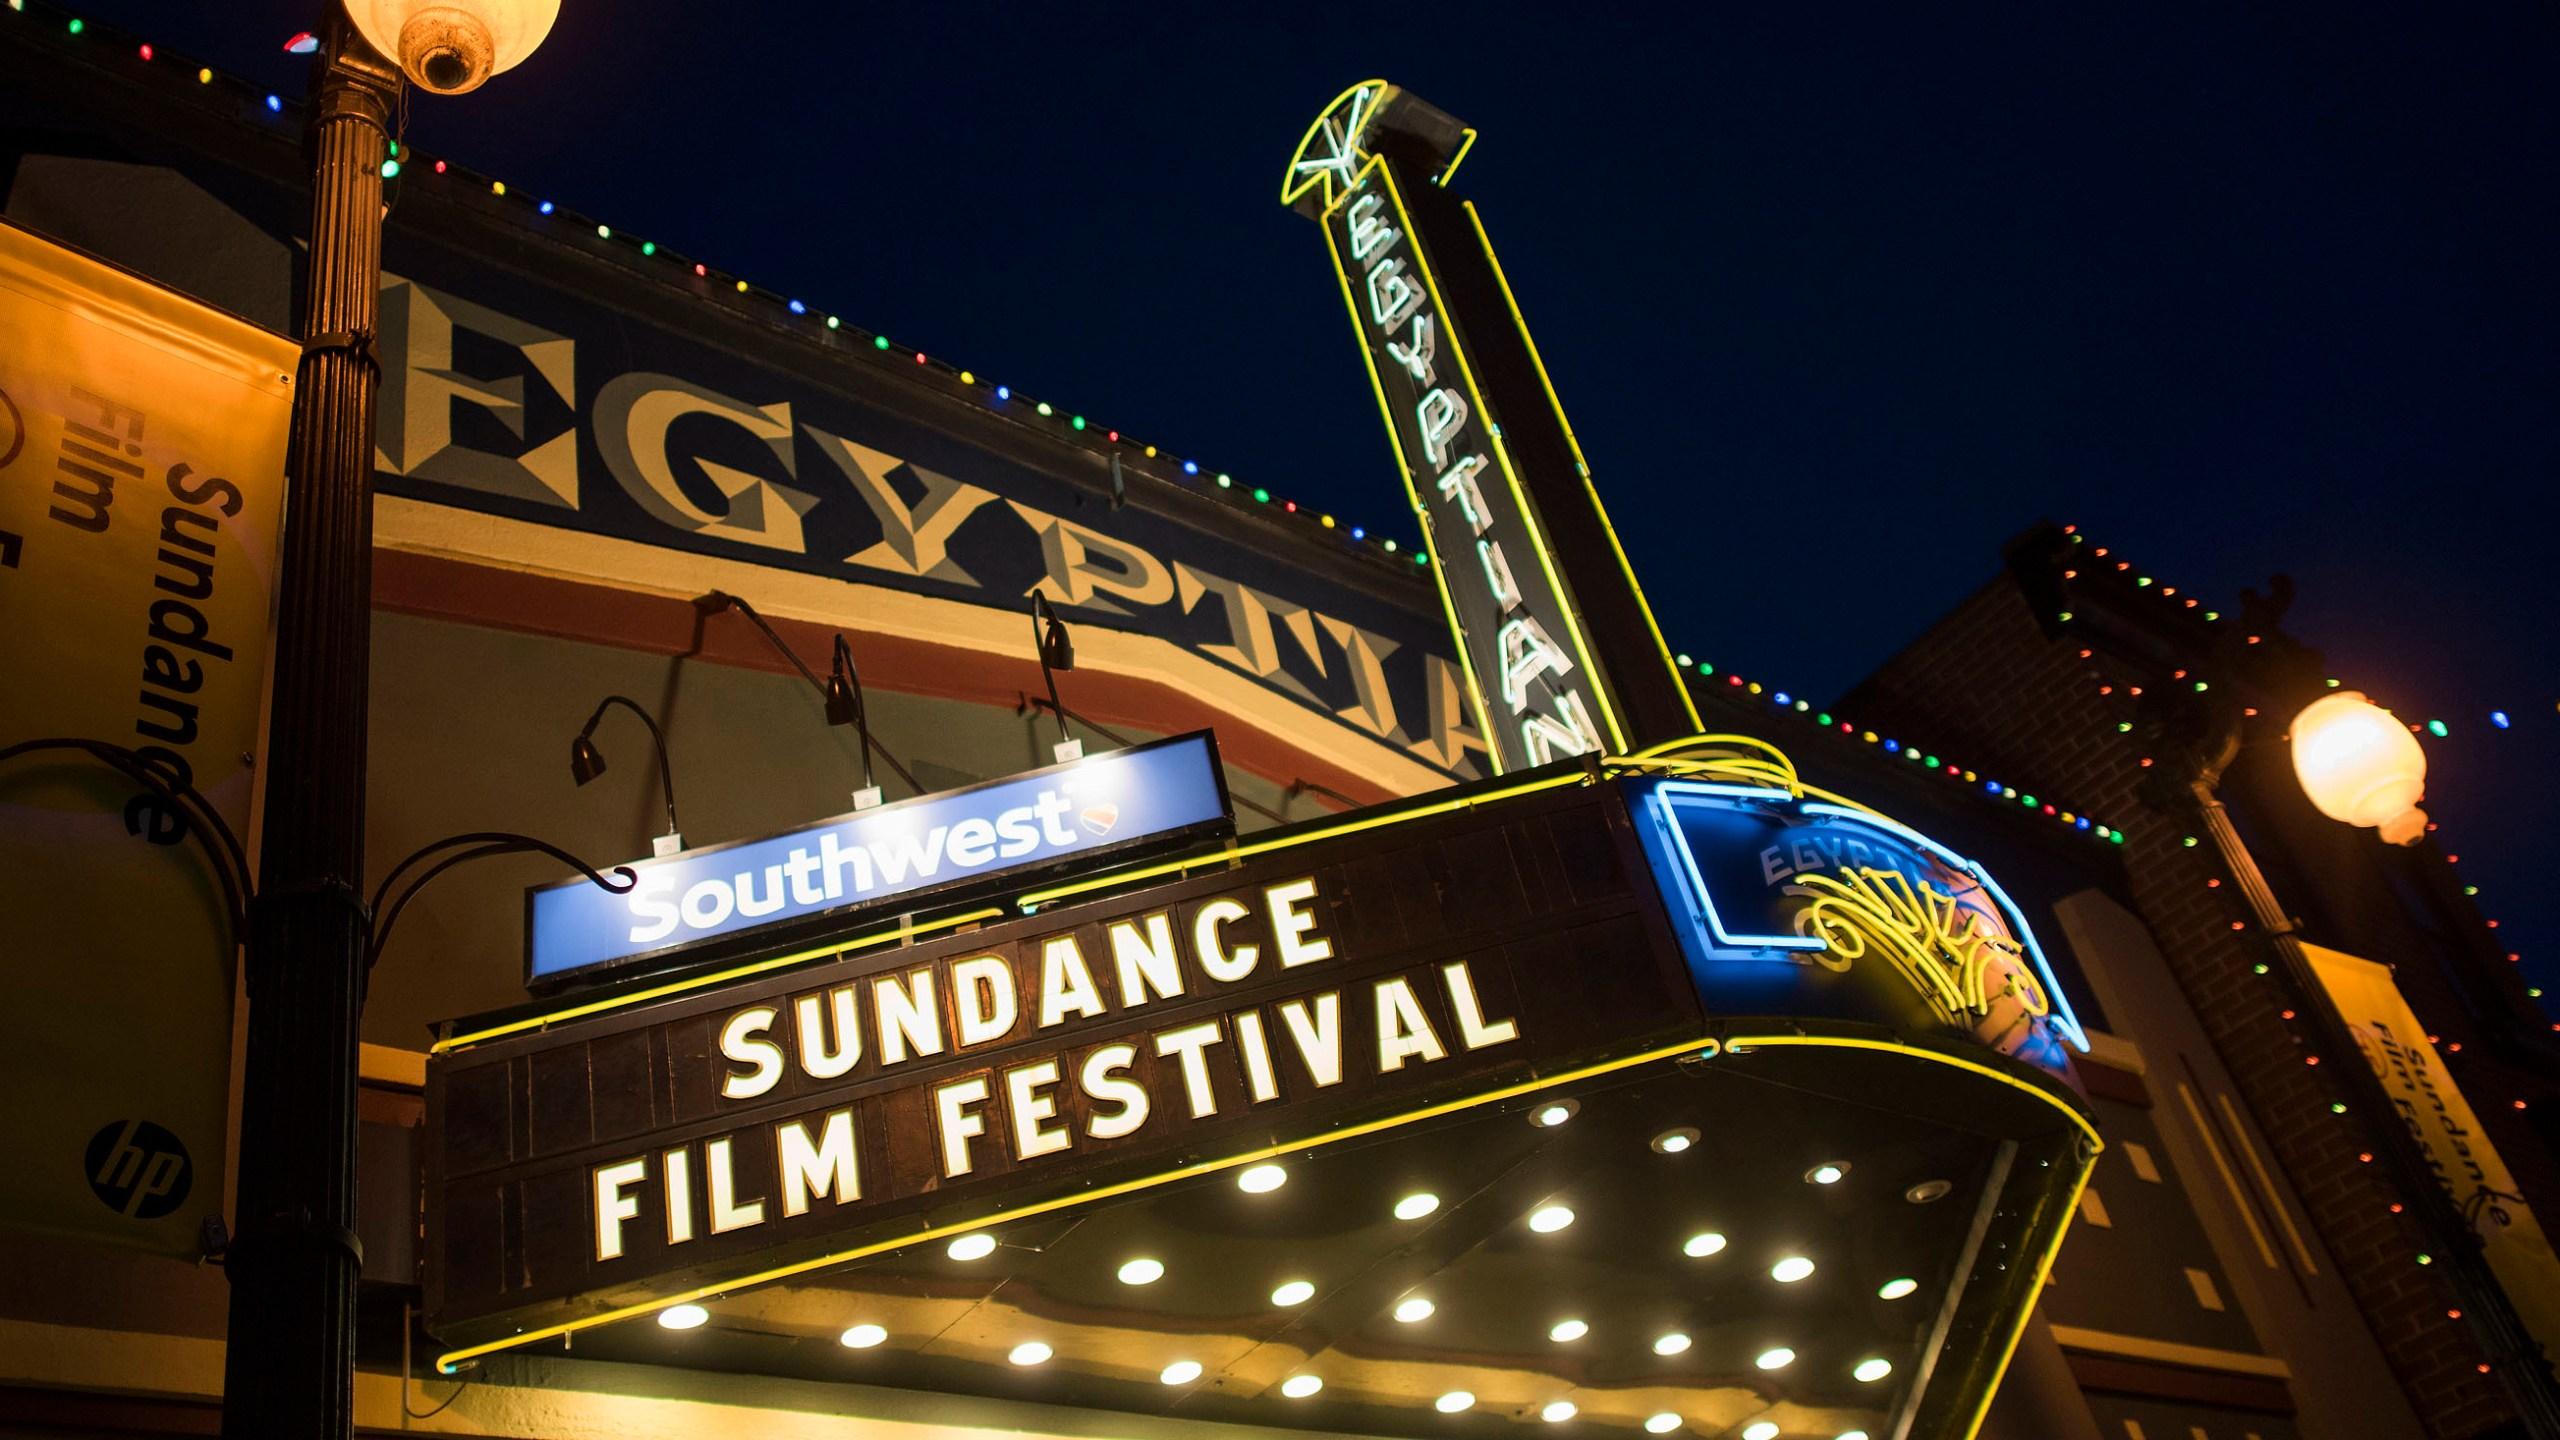 Sundance_Film_Festival-Curtain_Raiser_17289-159532.jpg99622252